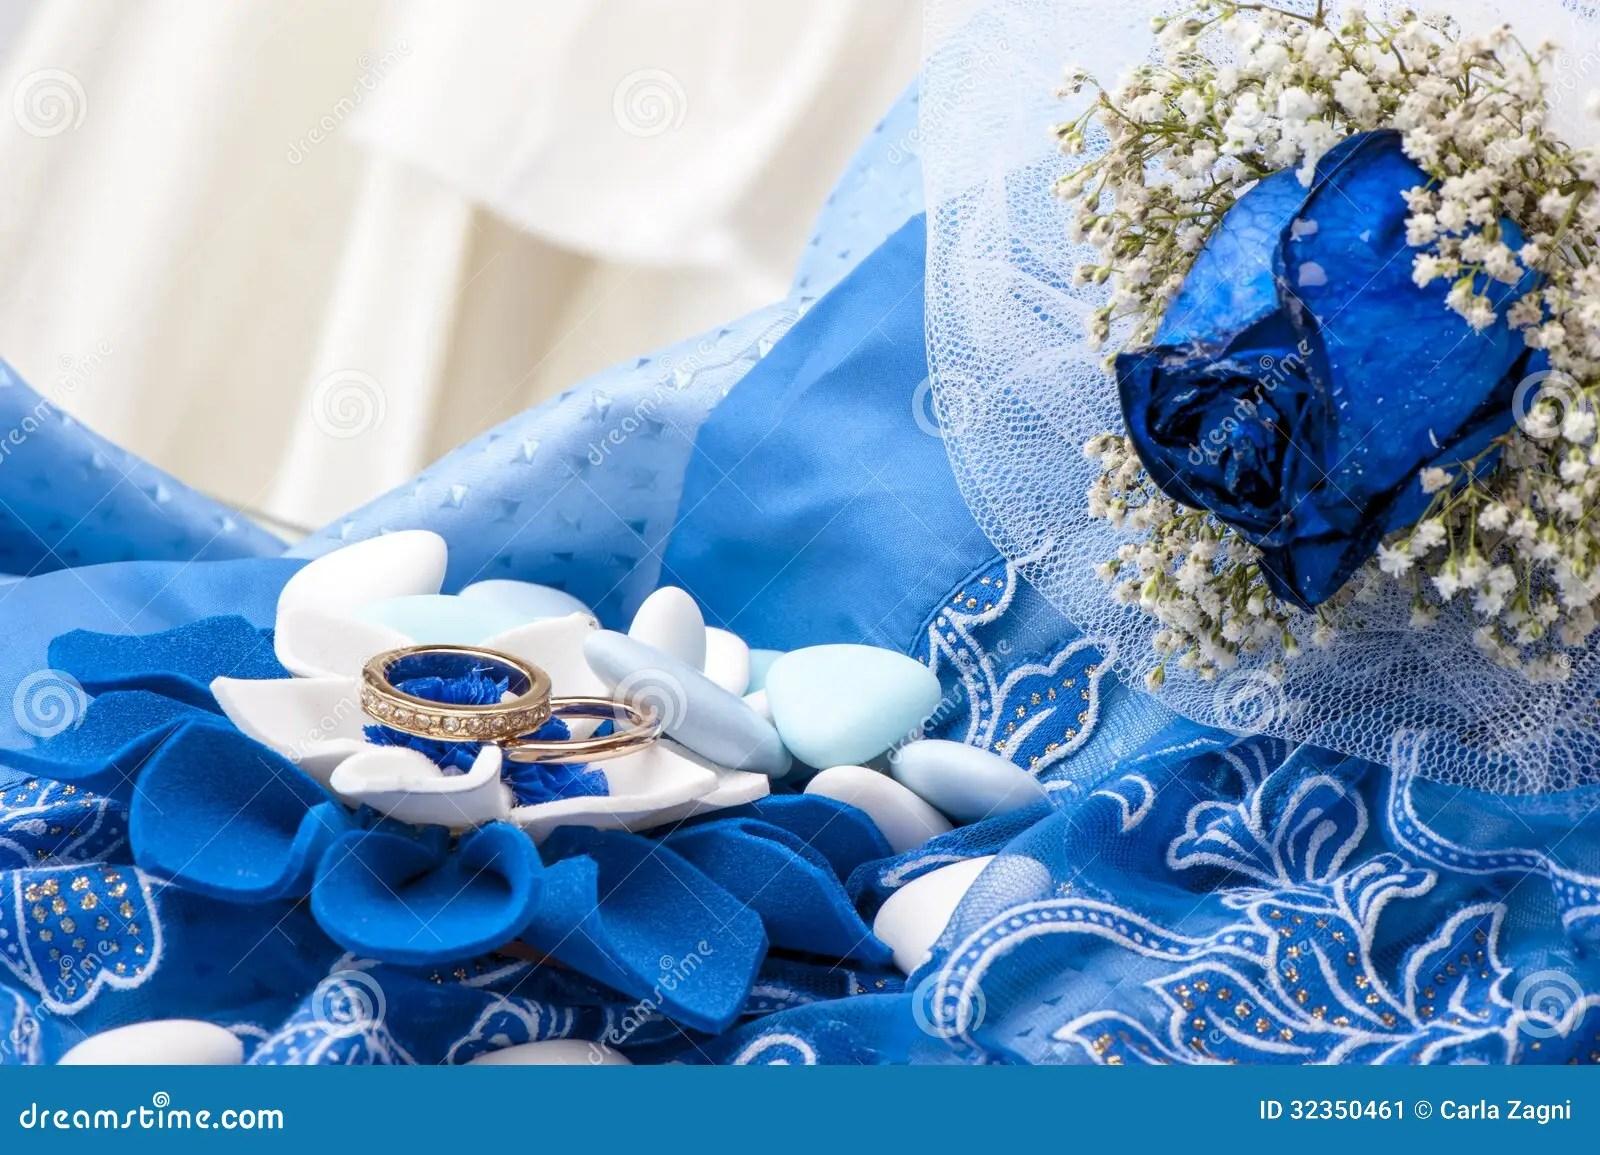 stock image blue roses wedding rings white background image blue wedding rings A blue roses and wedding rings